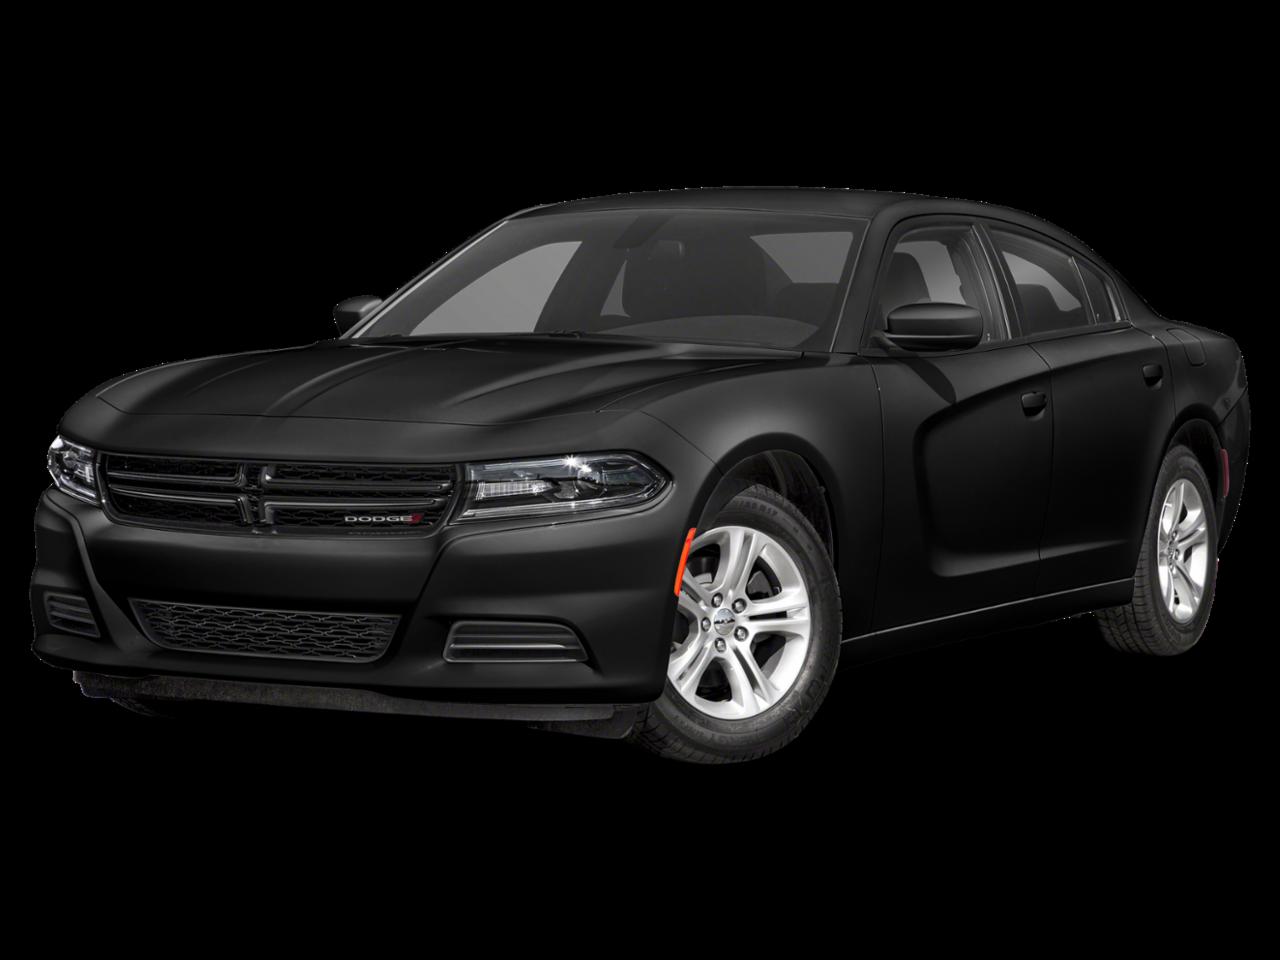 2021 Dodge Charger 4dr Car